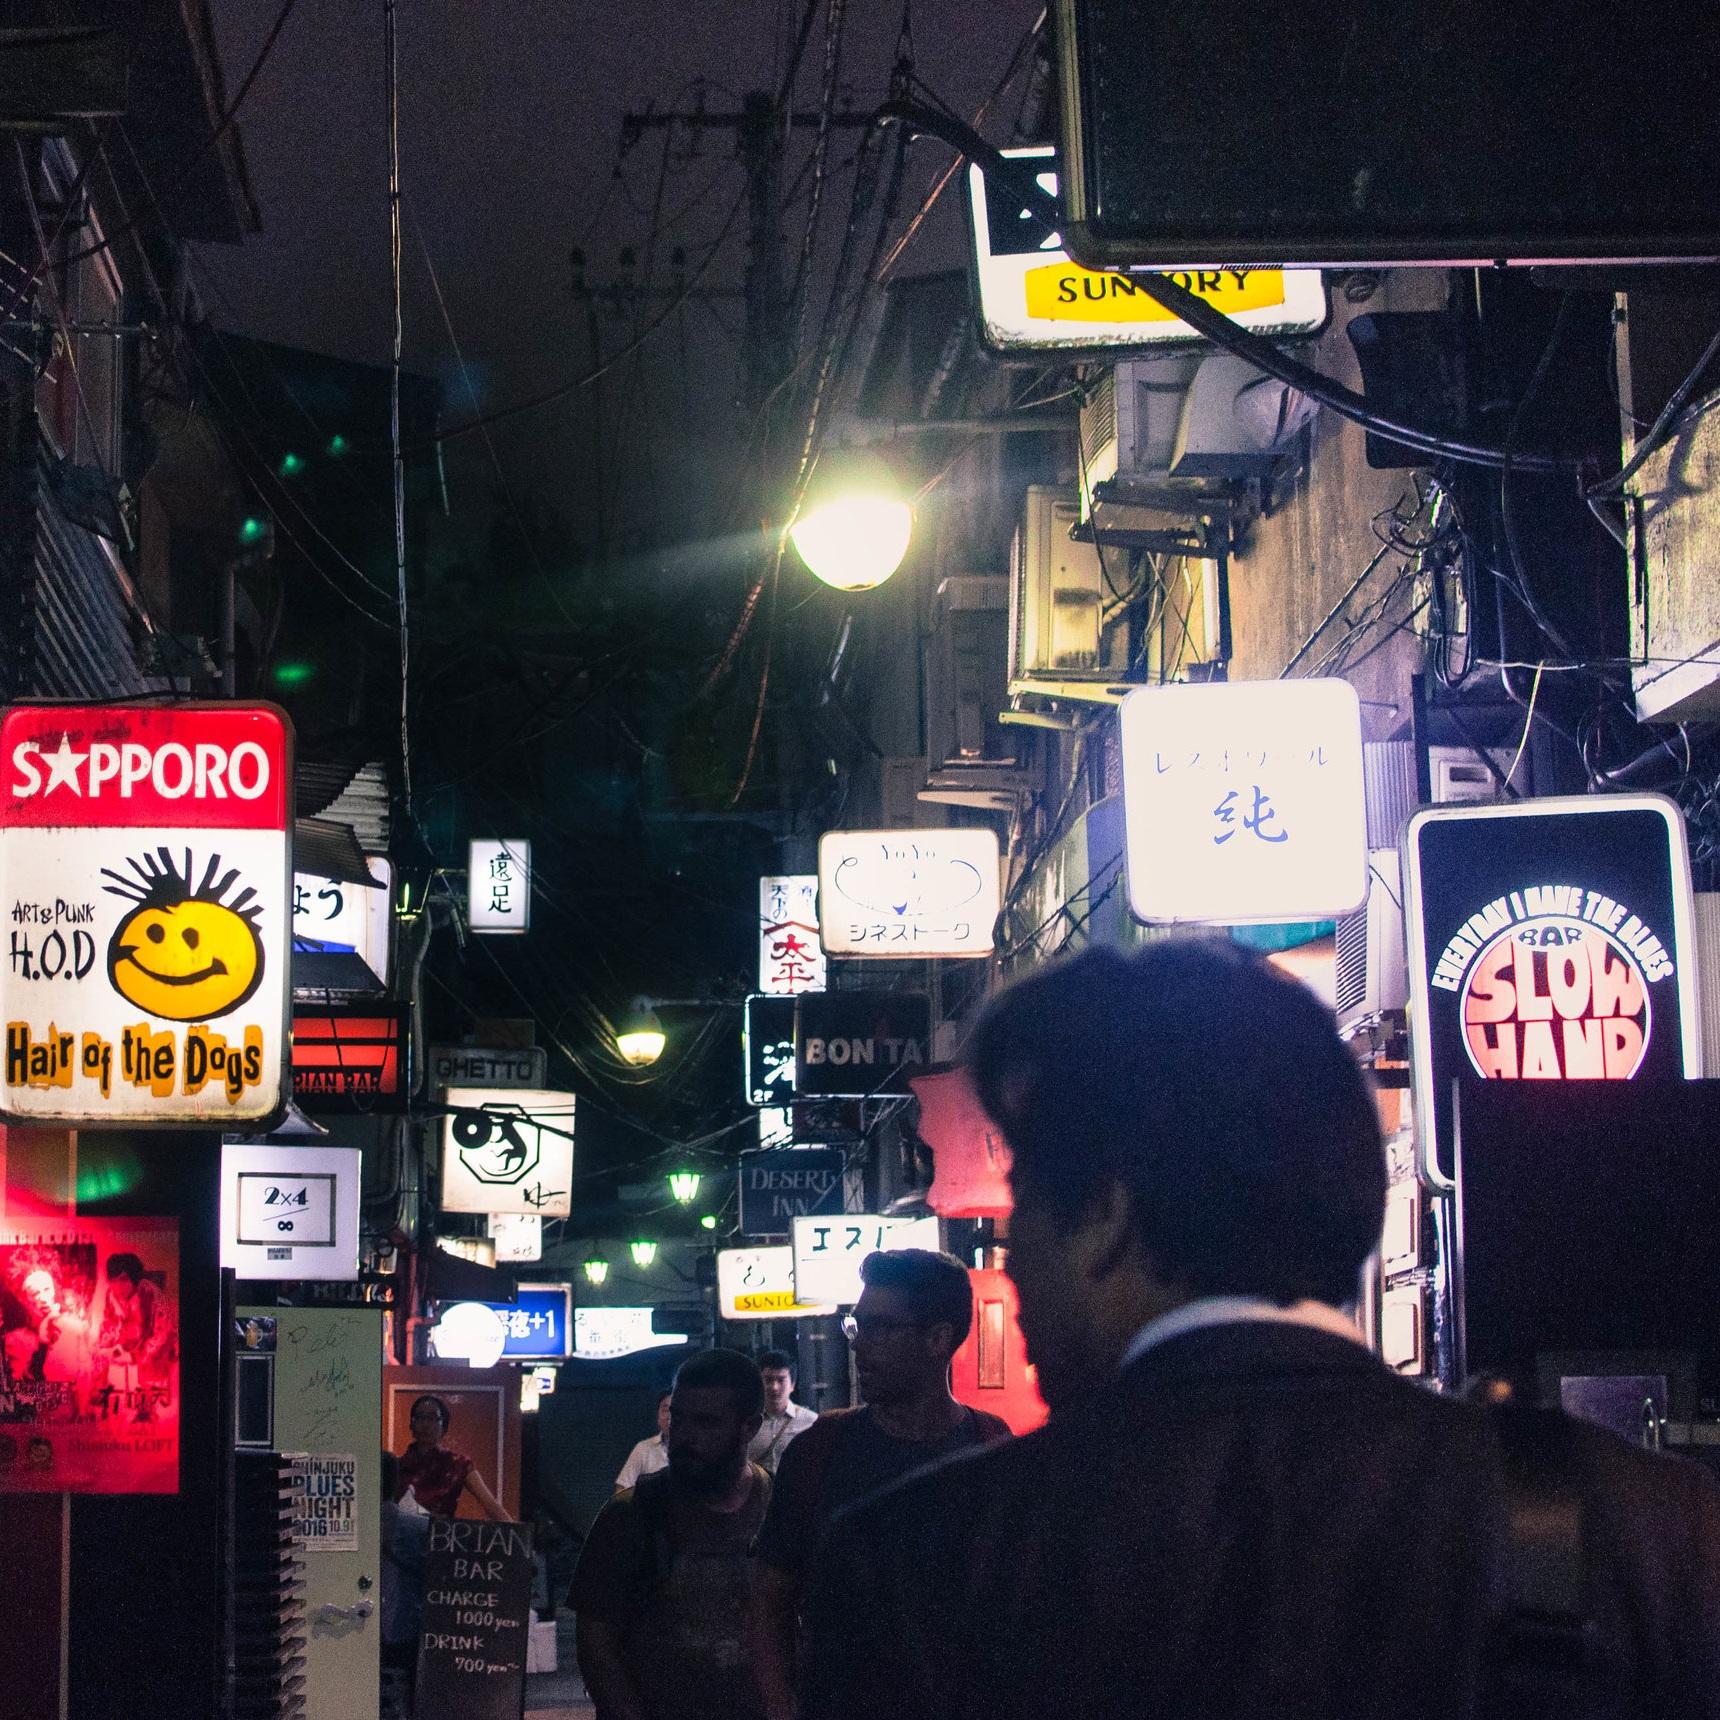 Golden Gai. Part of Tokyo itinerary 7 days